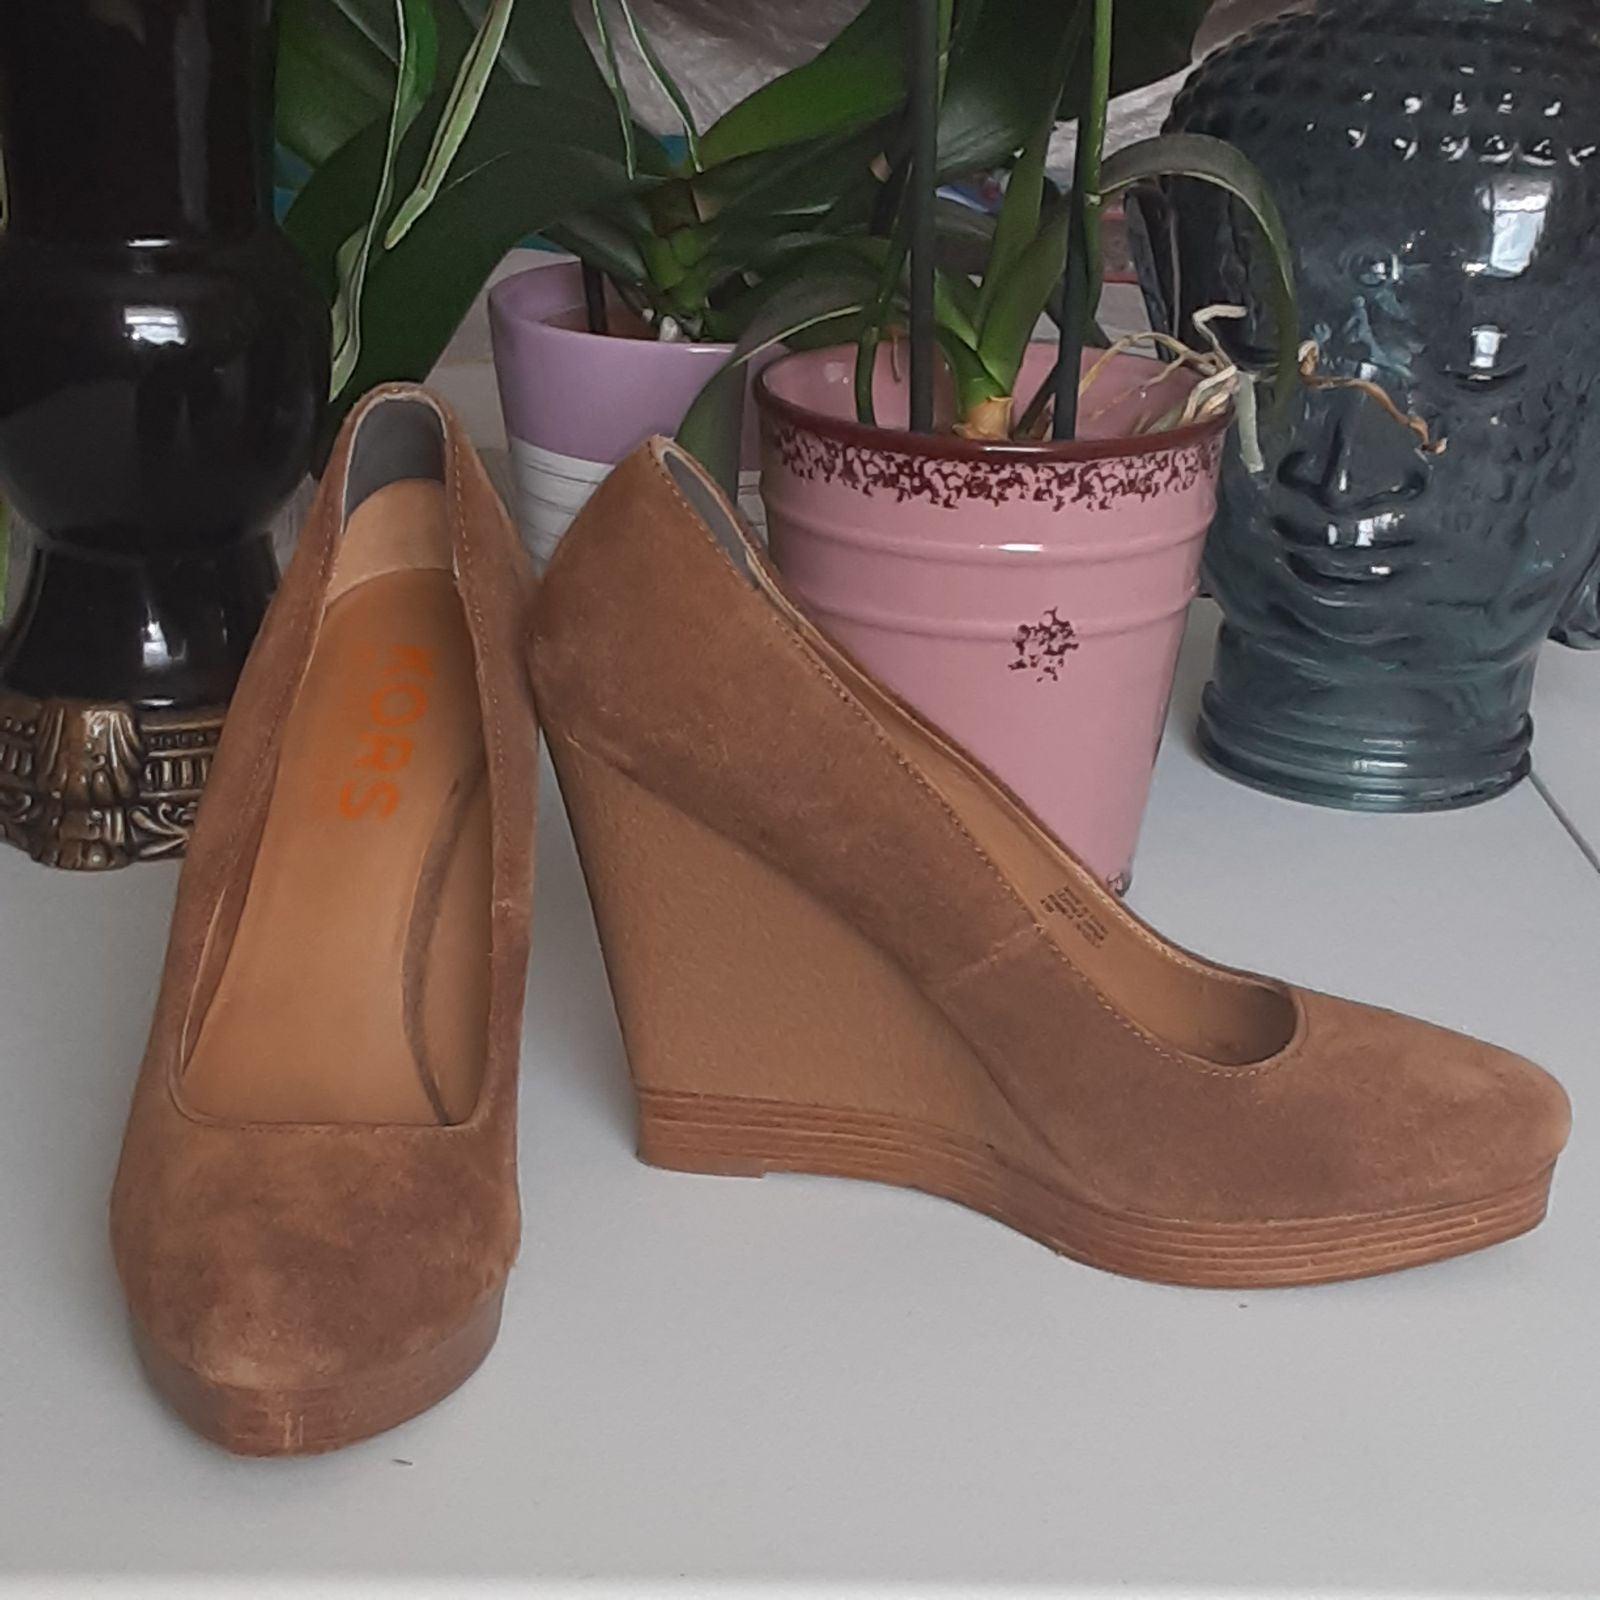 Michael Kors Suade Wedge Shoes- Woman 8.